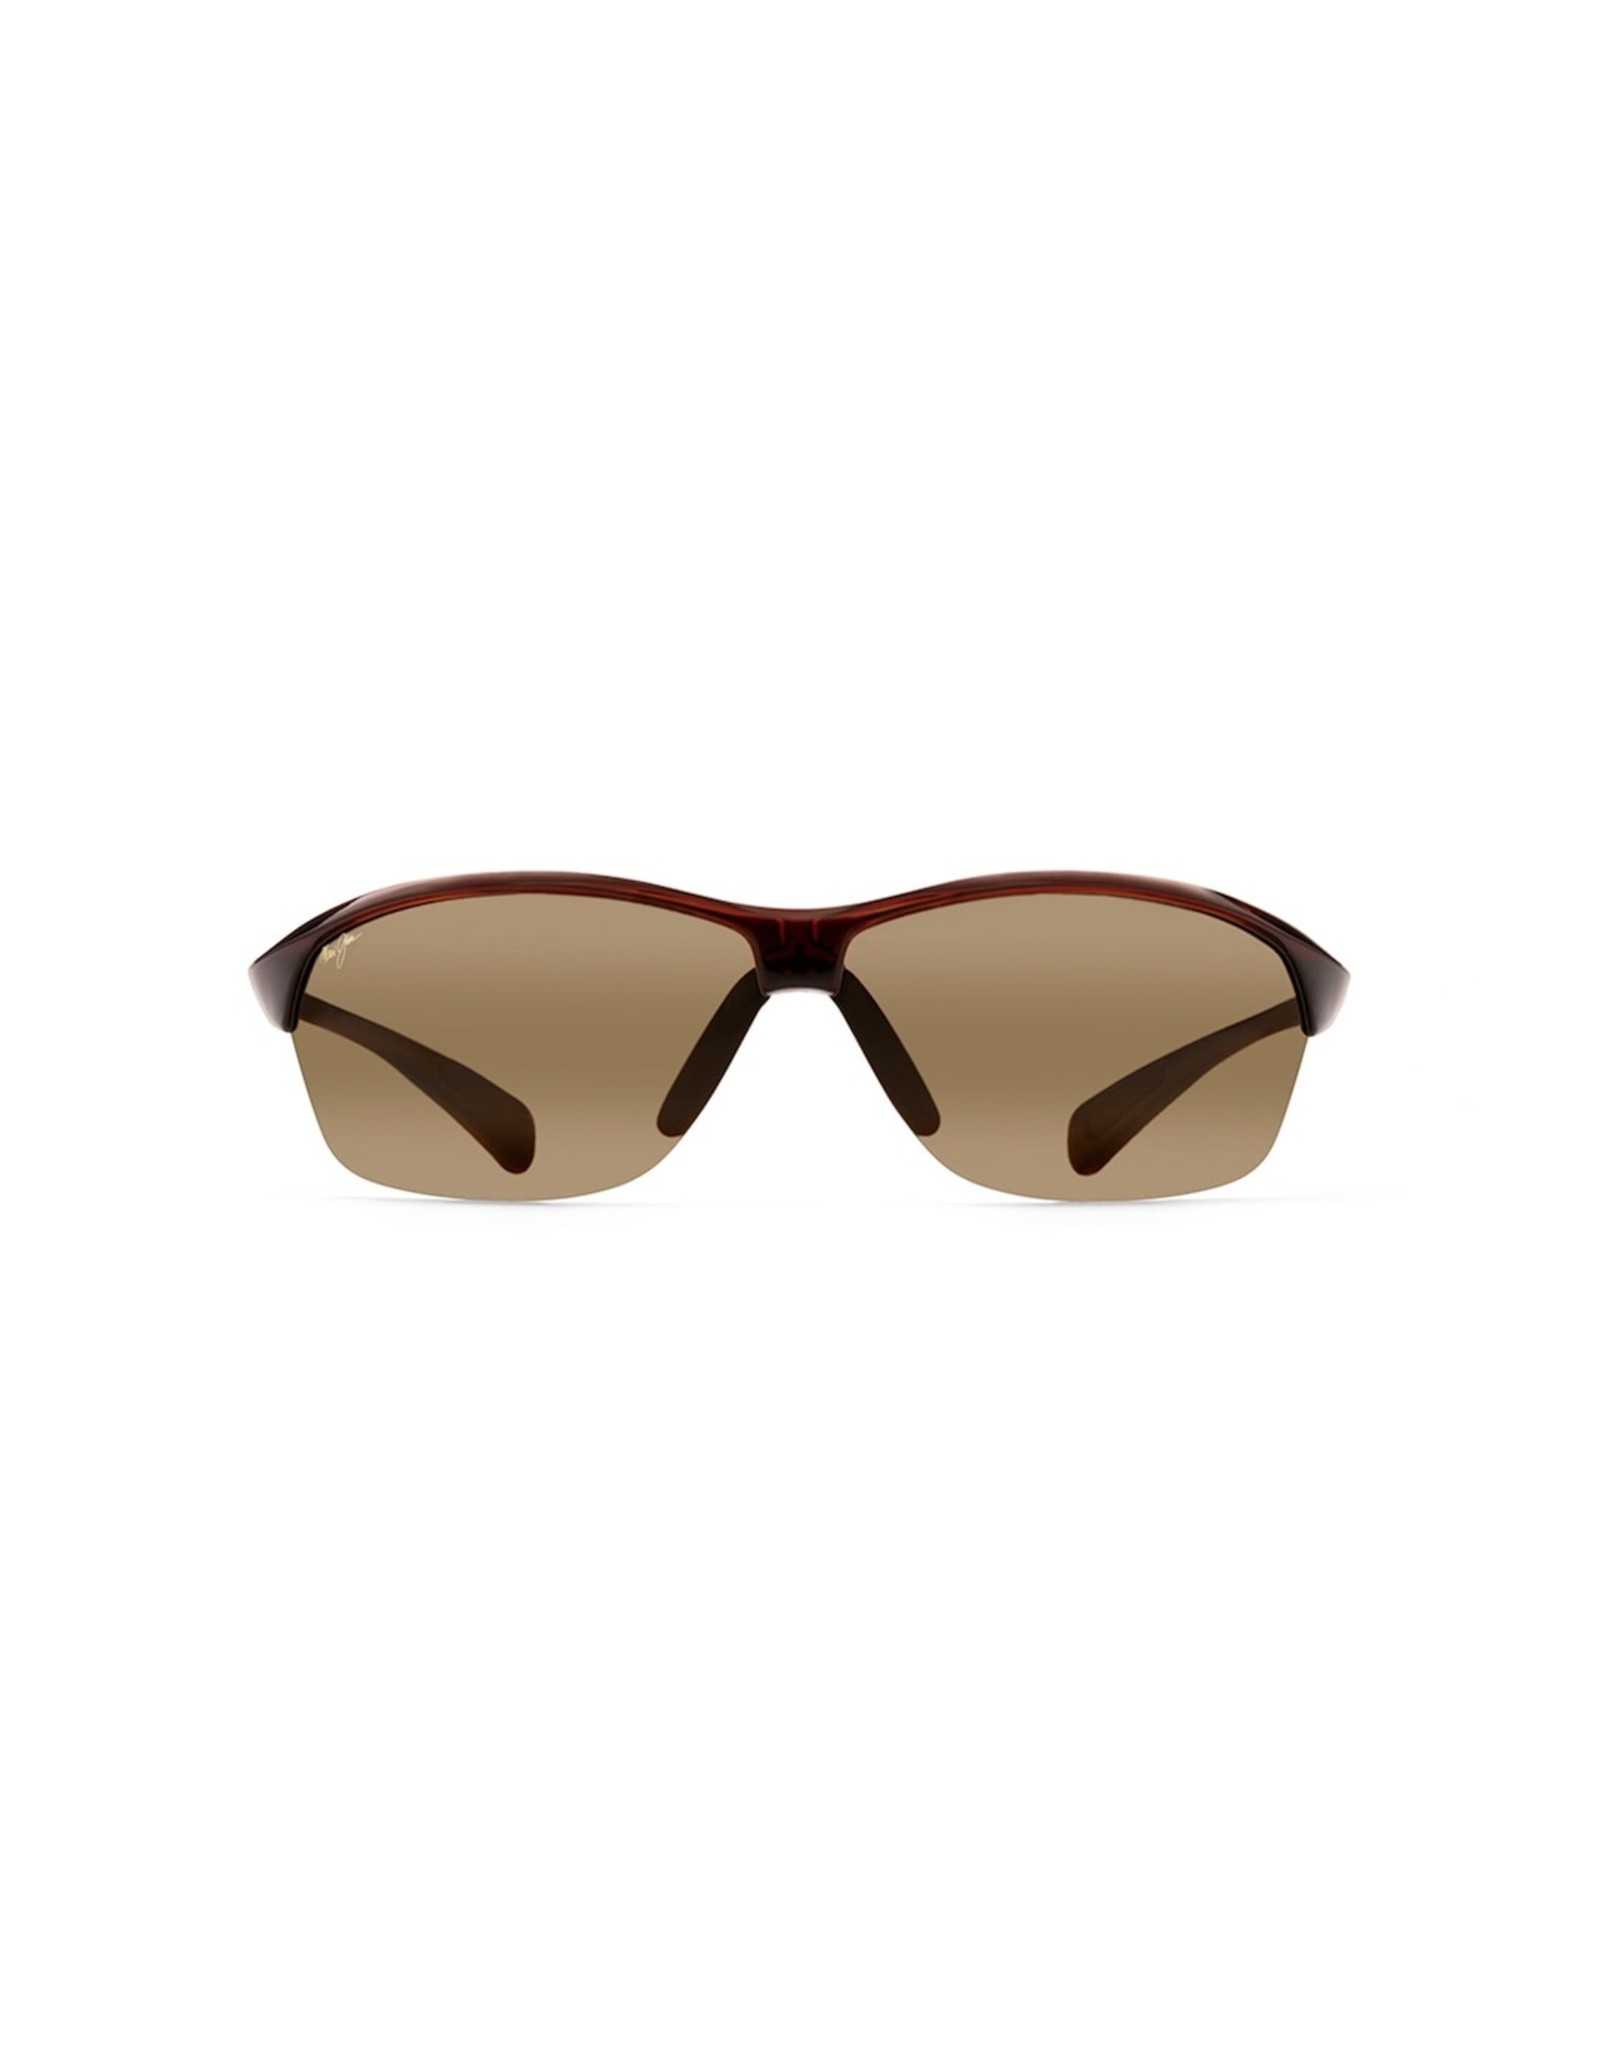 Maui Jim Maui Jim 'Hot Sands' Sunglasses